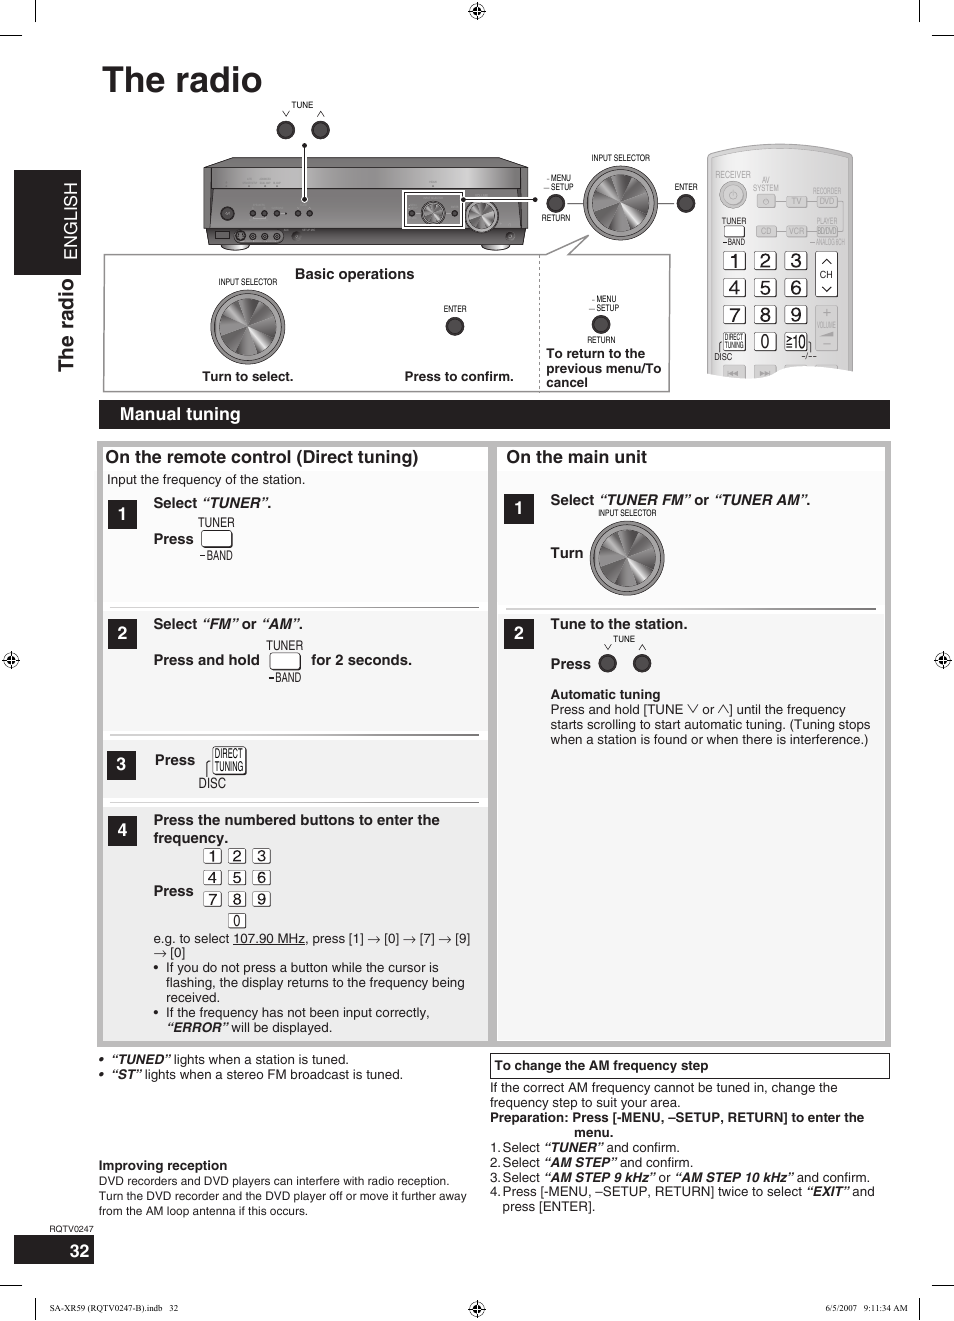 the radio english on the main unit panasonic sa xr59 user manual rh manualsdir com Panasonic Owner's Manual Panasonic Technical Support